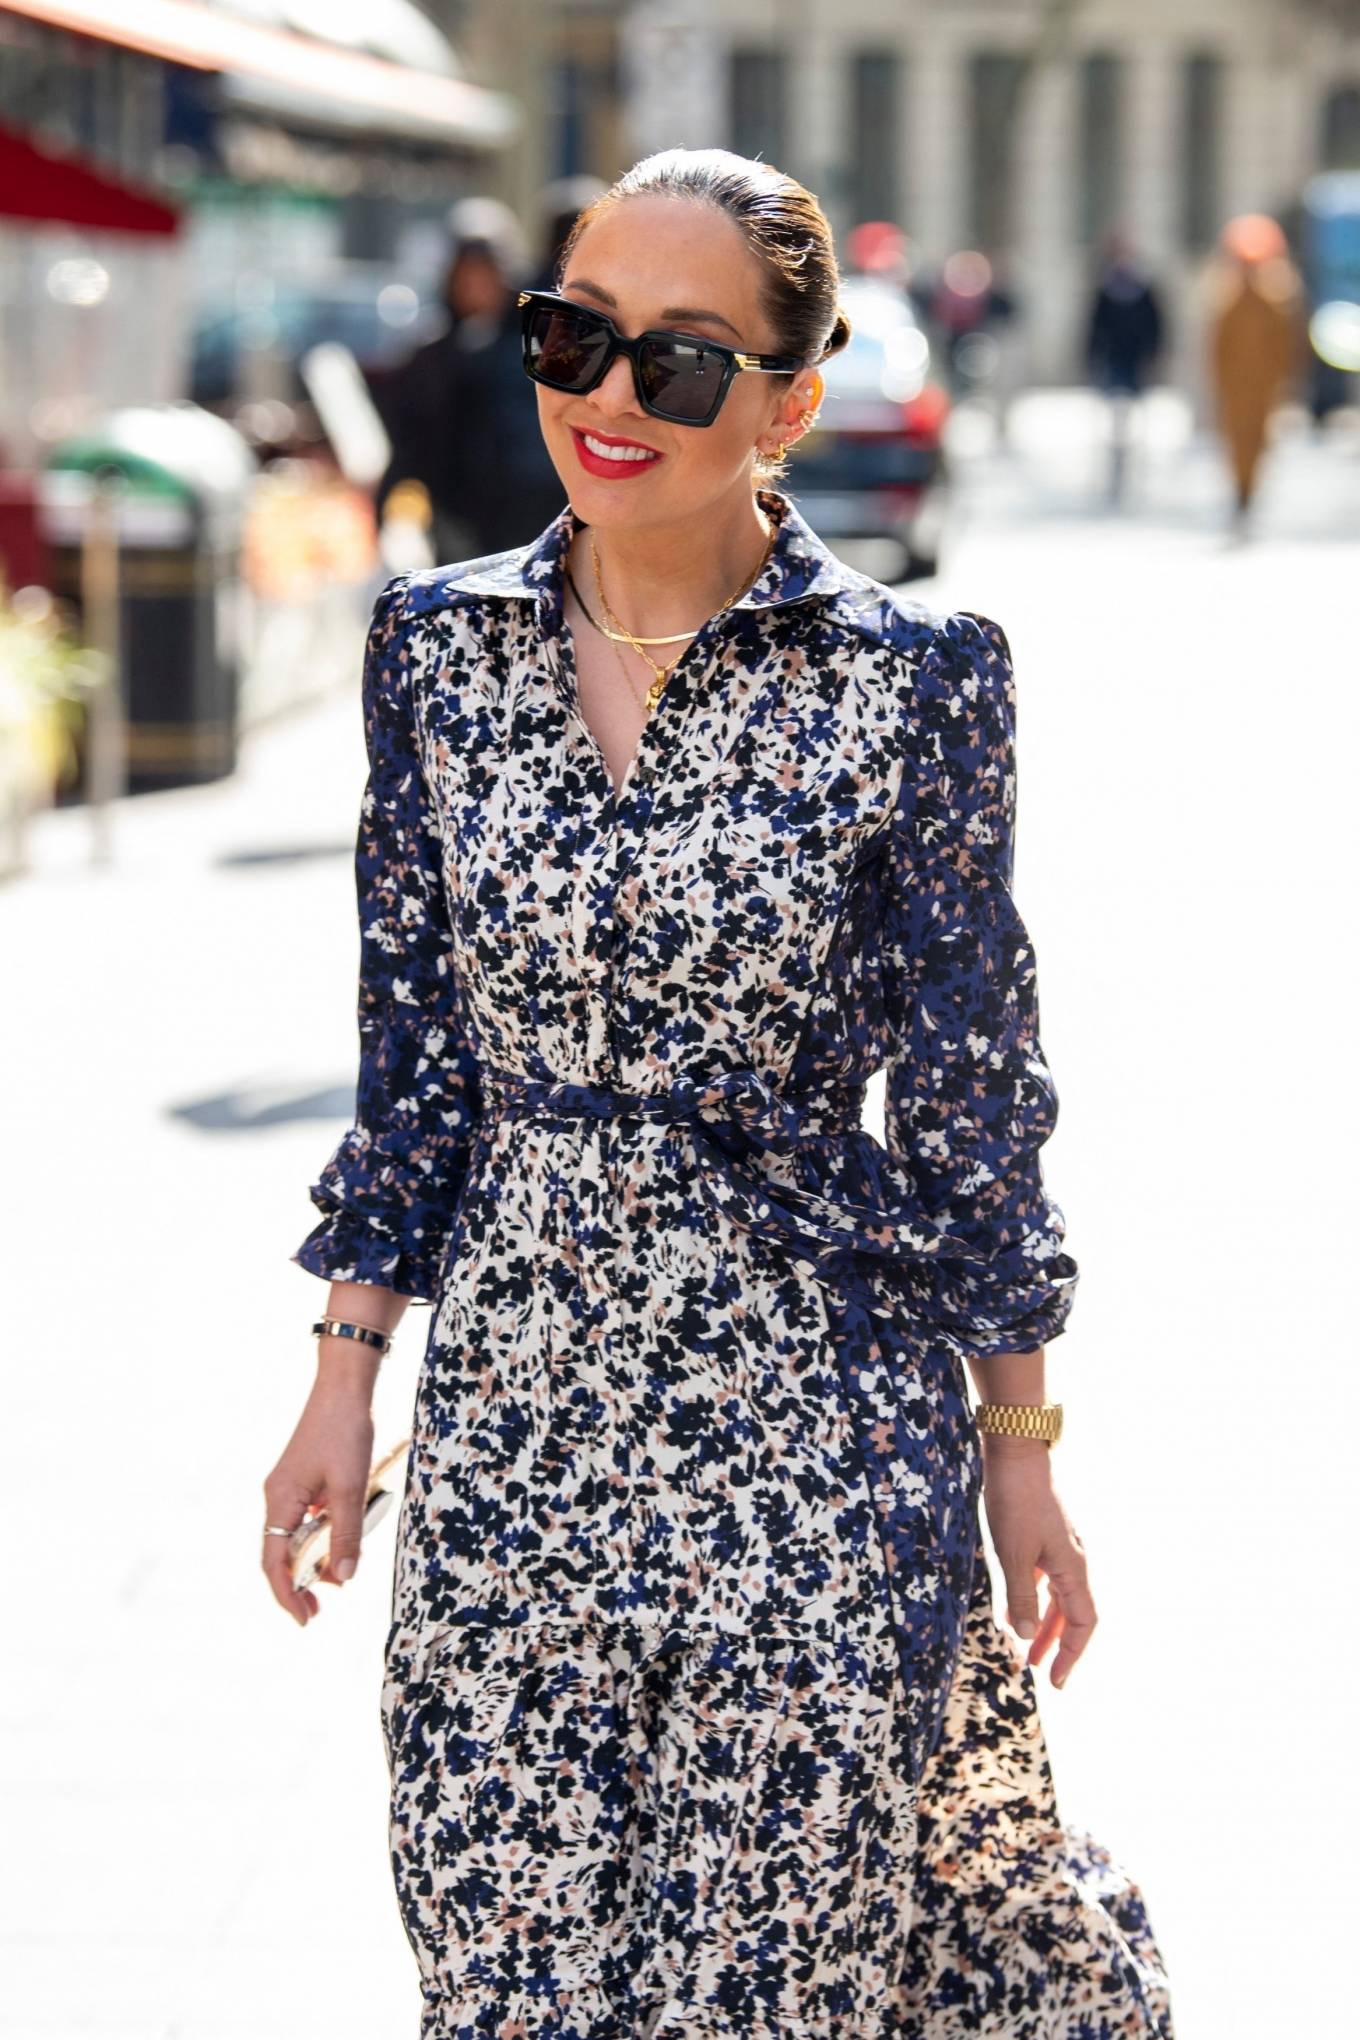 Myleene Klass 2021 : Myleene Klass – In a long summer dress arriving at the Global studios -04